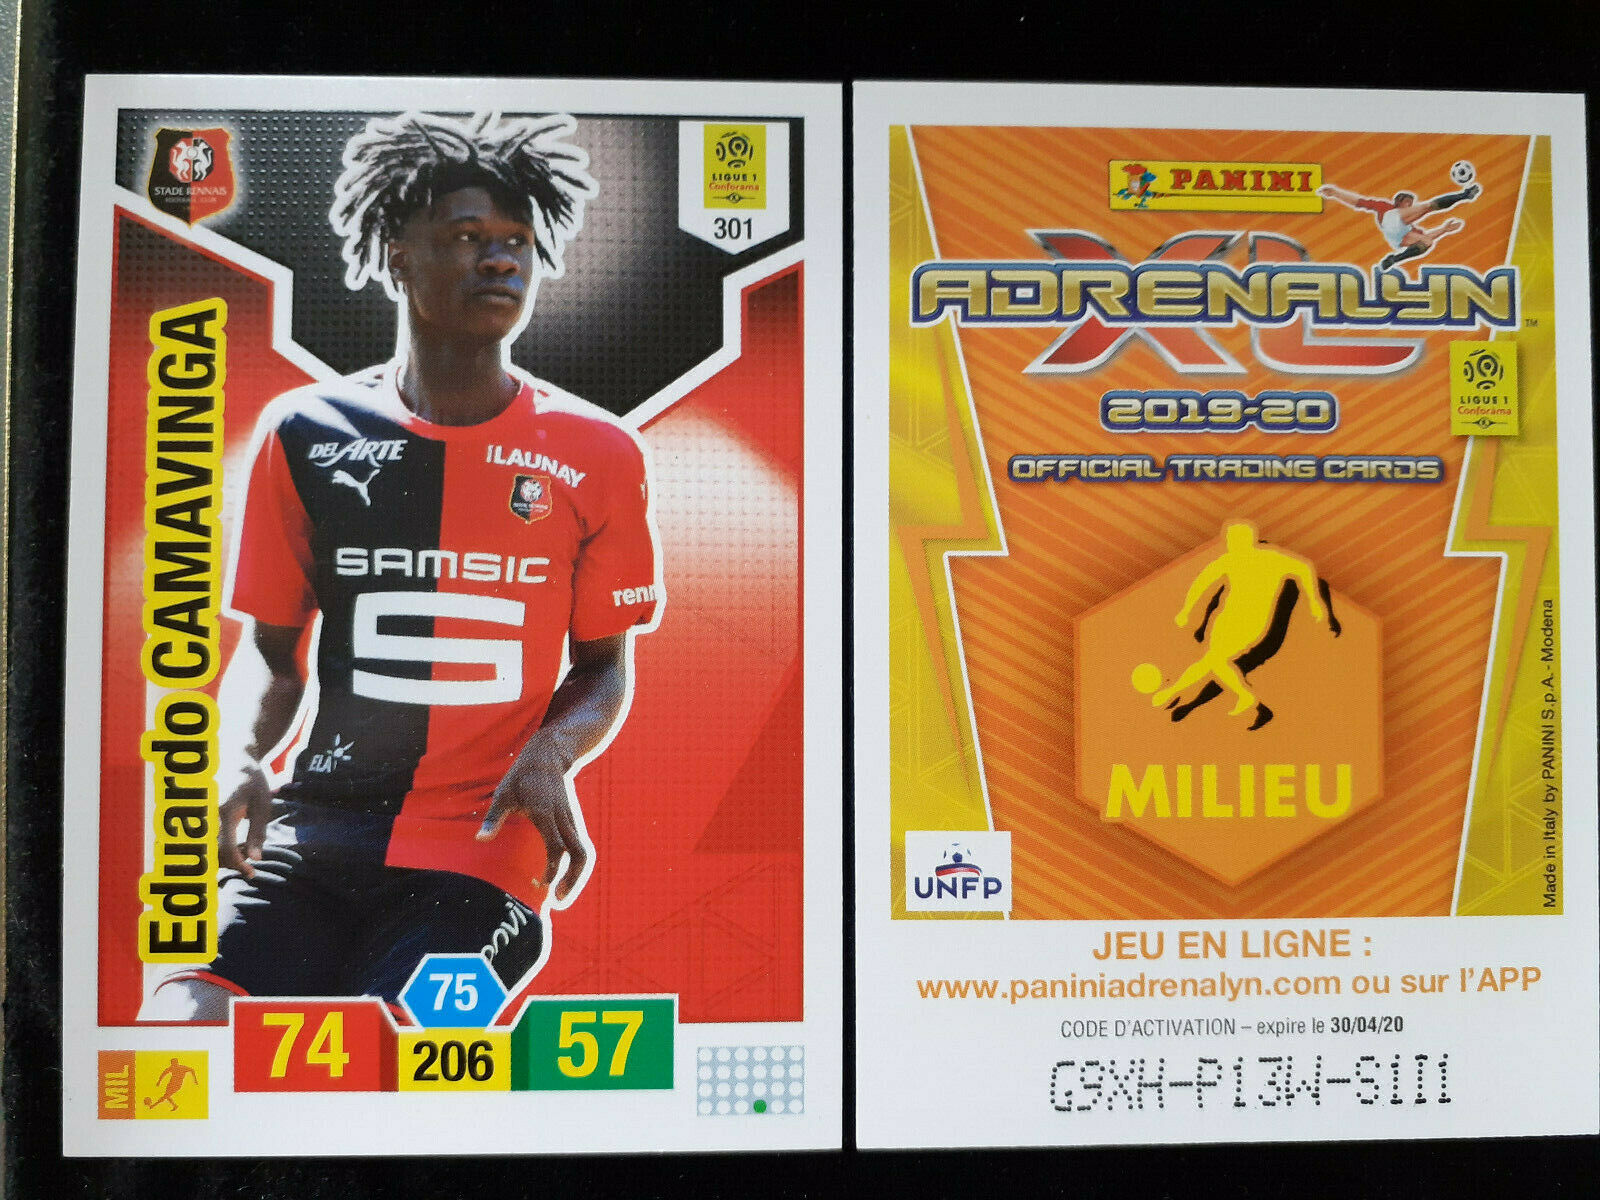 Eduardo camavinga rookie 301 rennes panini adrenalyn xl 2019-20 real madrid?